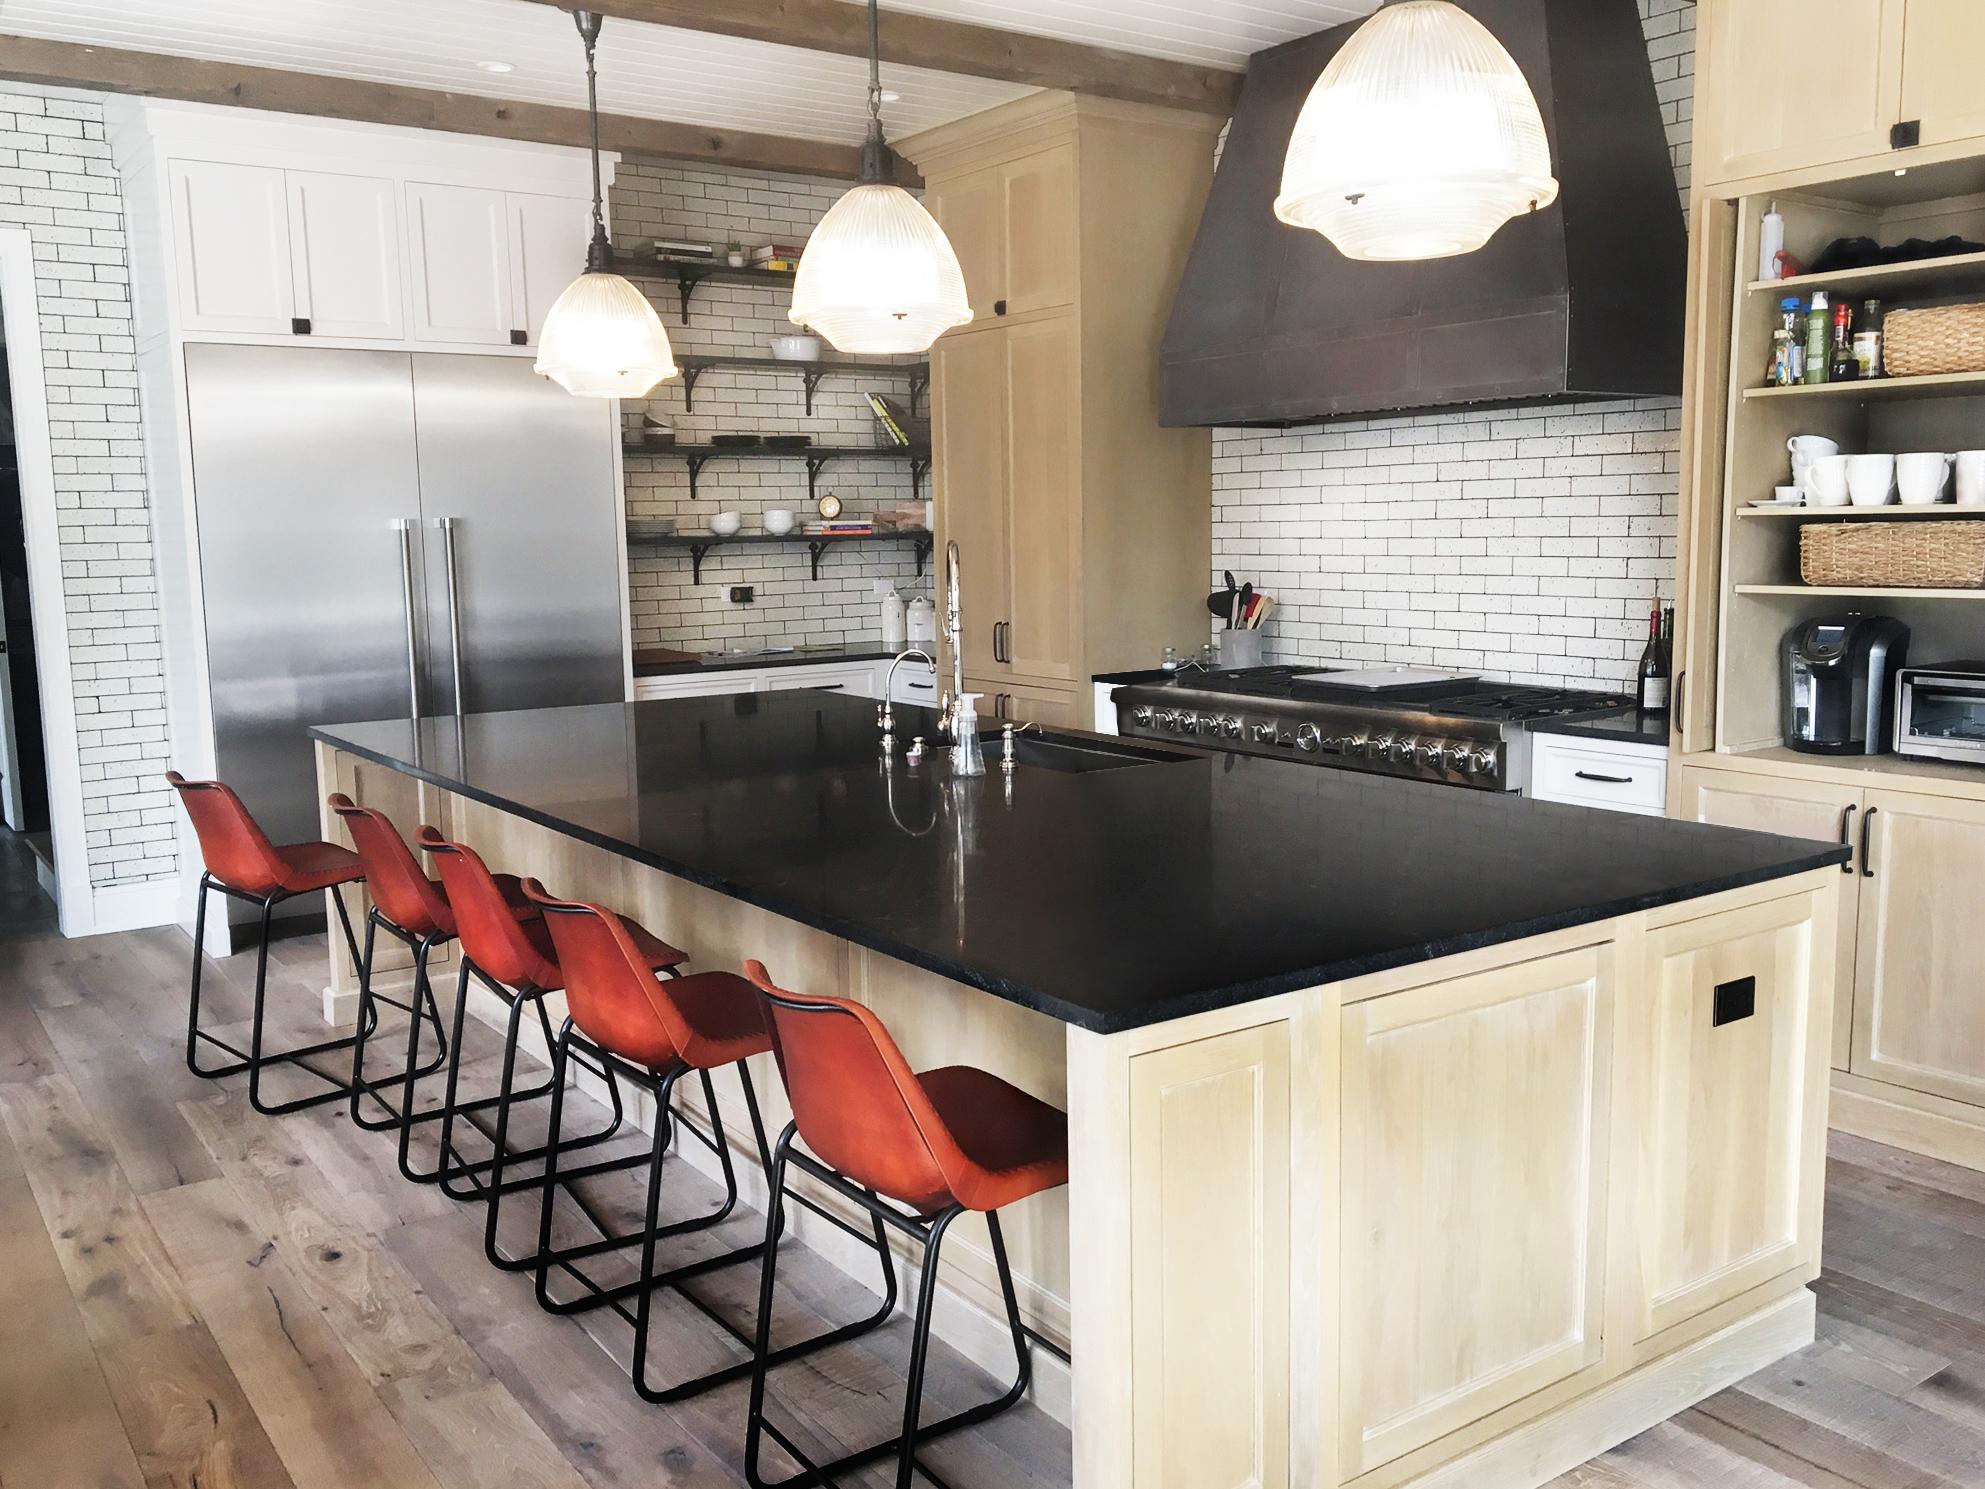 Red rock Maletzky 416 dell kitchen-1 (1).jpg